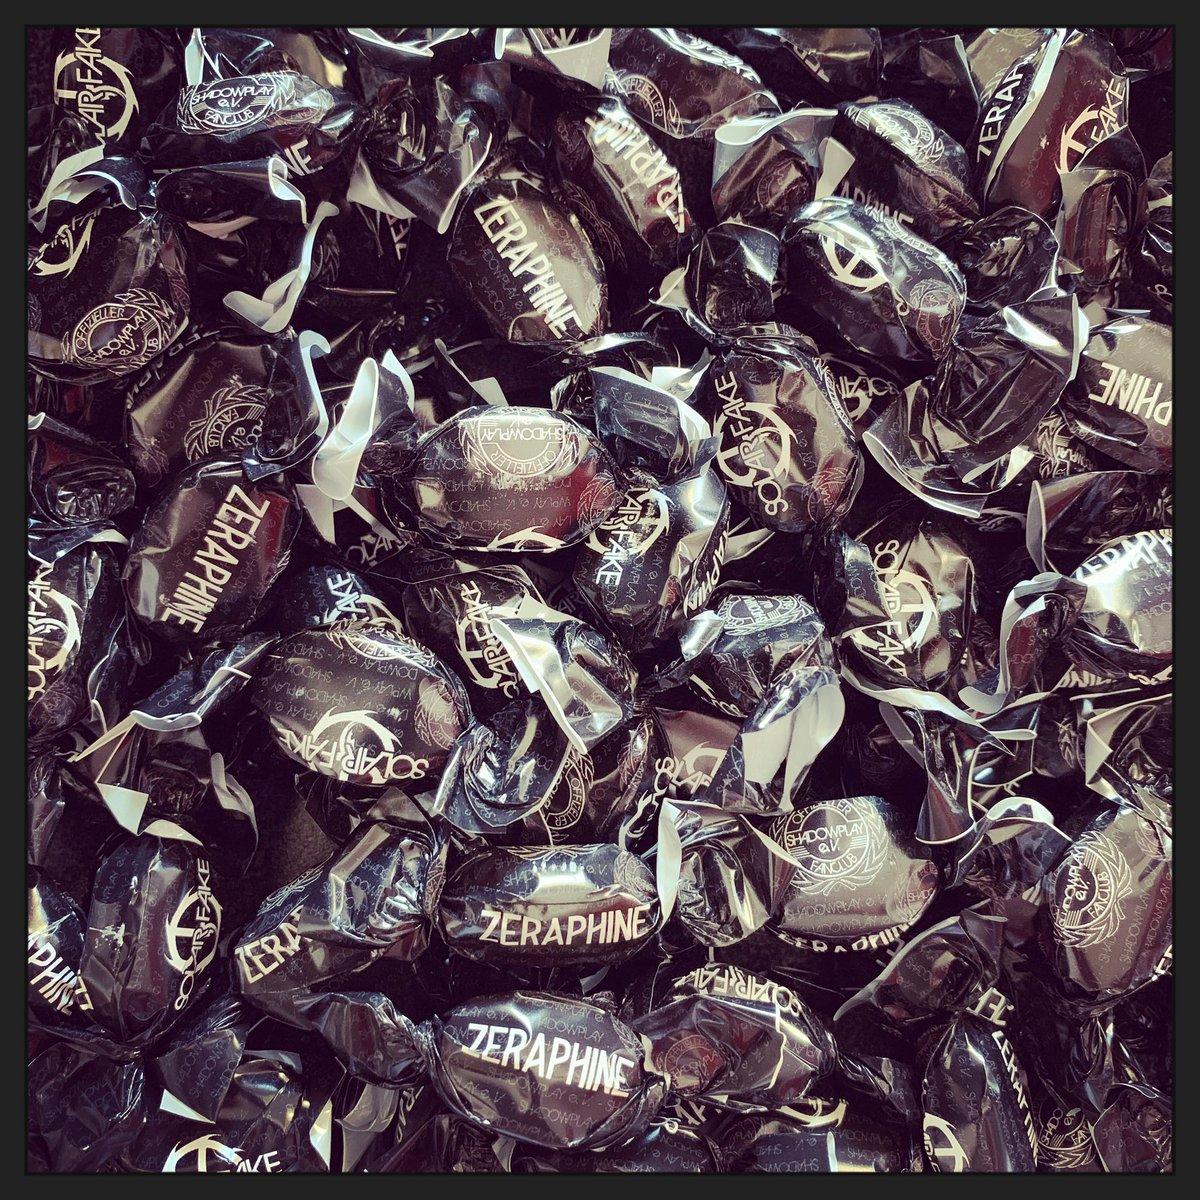 Sweets for my sweet, sugar for my fan club...  Schönen guten Abend sagt Shadowplay e. V. #sweets #bonbons #shadowplay #shadowplay_ev pic.twitter.com/Jmne8SjdGE